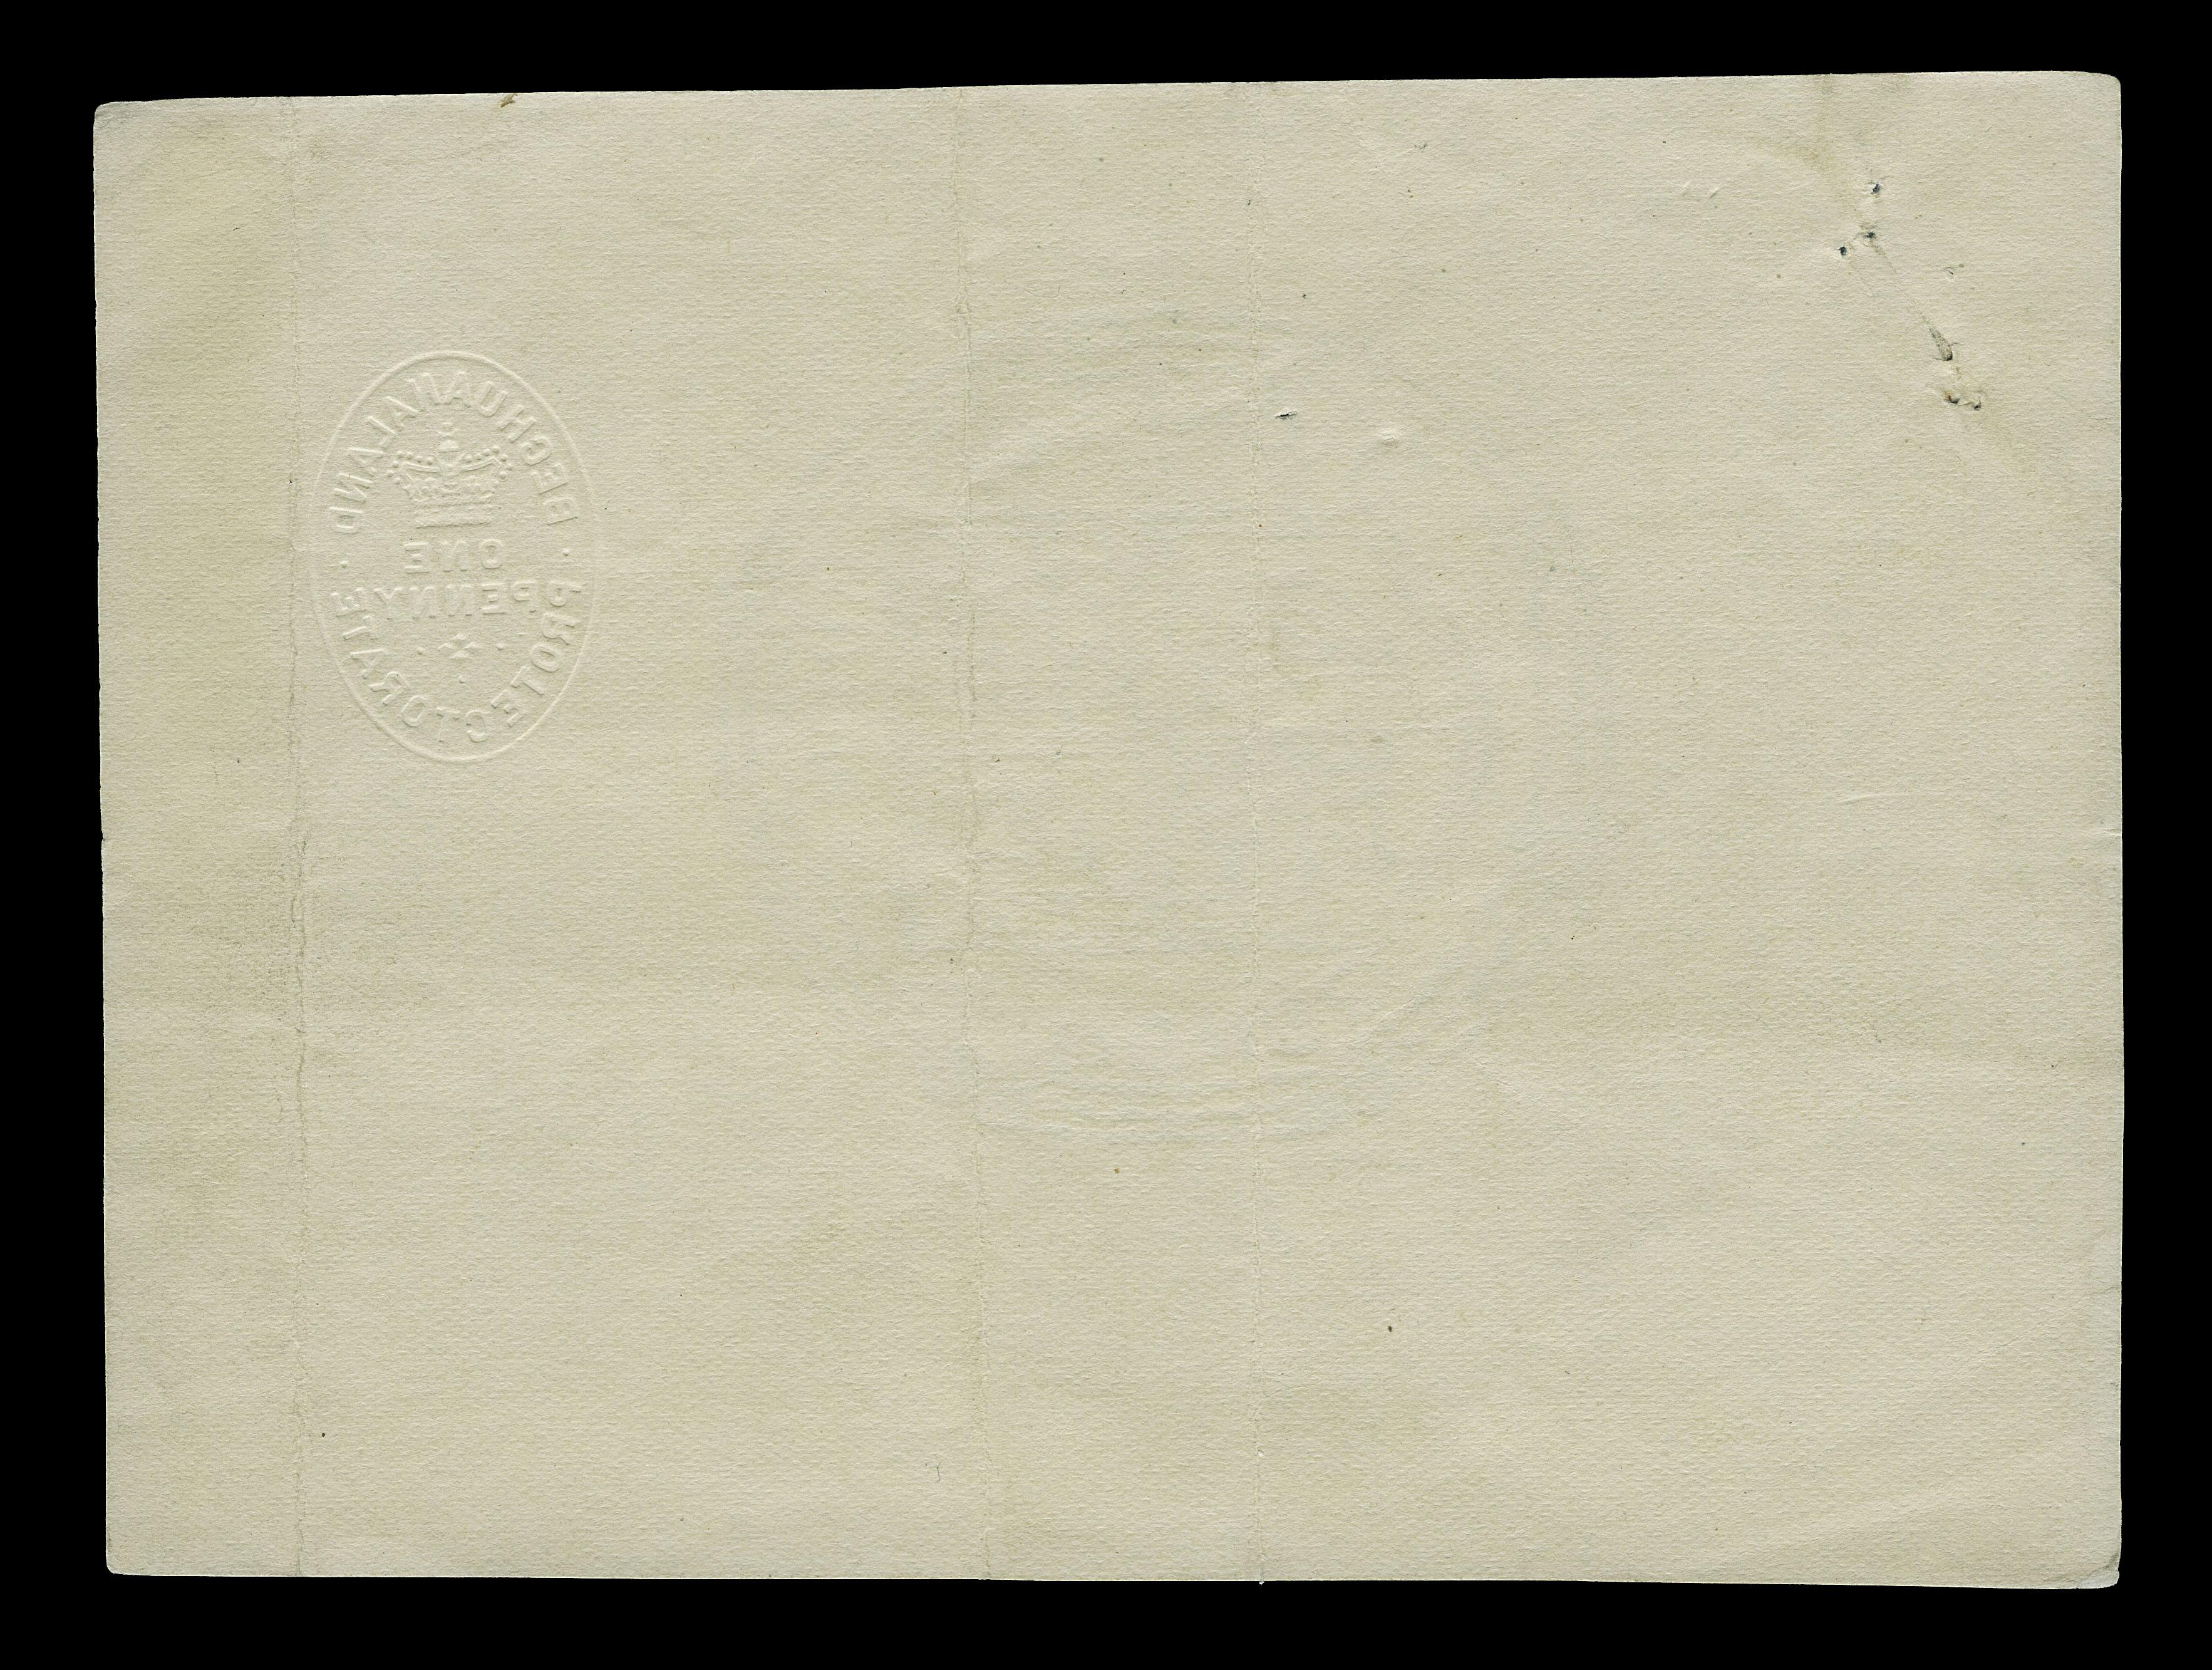 Afrique du Sud, Sir Robert Stephenson Smyth Baden-Powell Standard Bank of South Africa, 1 livre(anglaise) : 1900